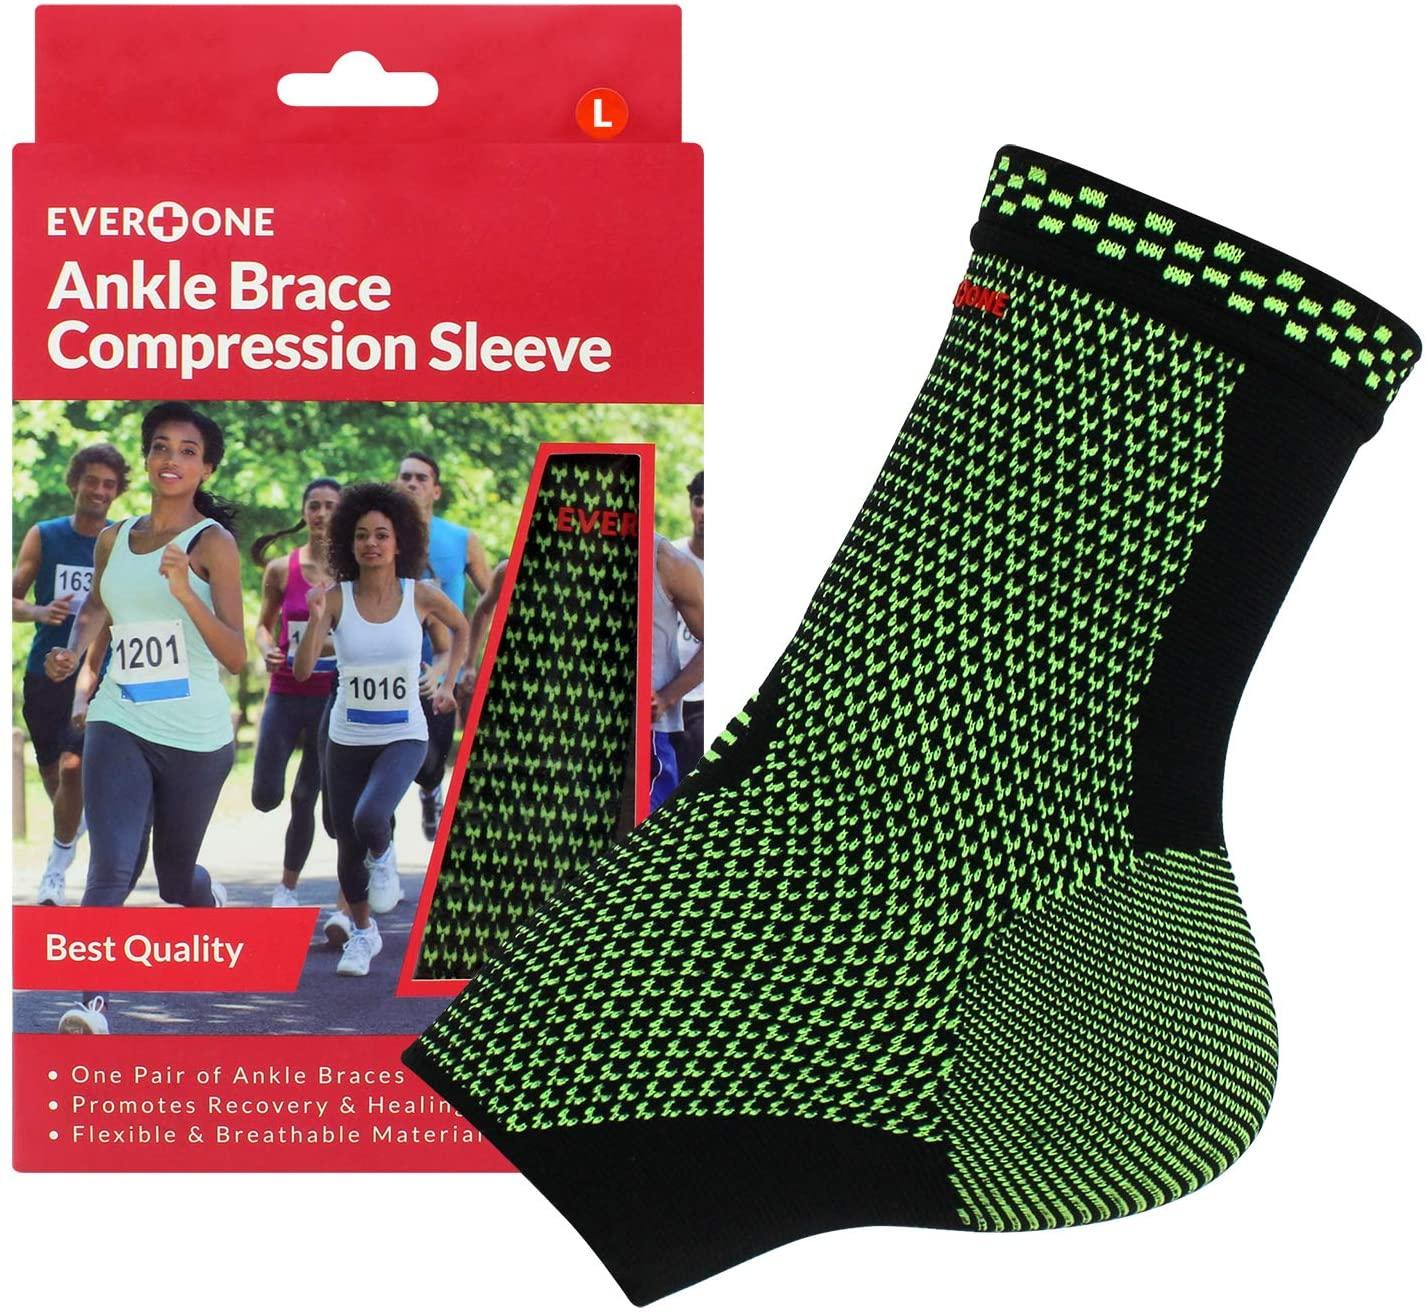 EverOne Ankle Brace Compression Sleeve Unisex, Large